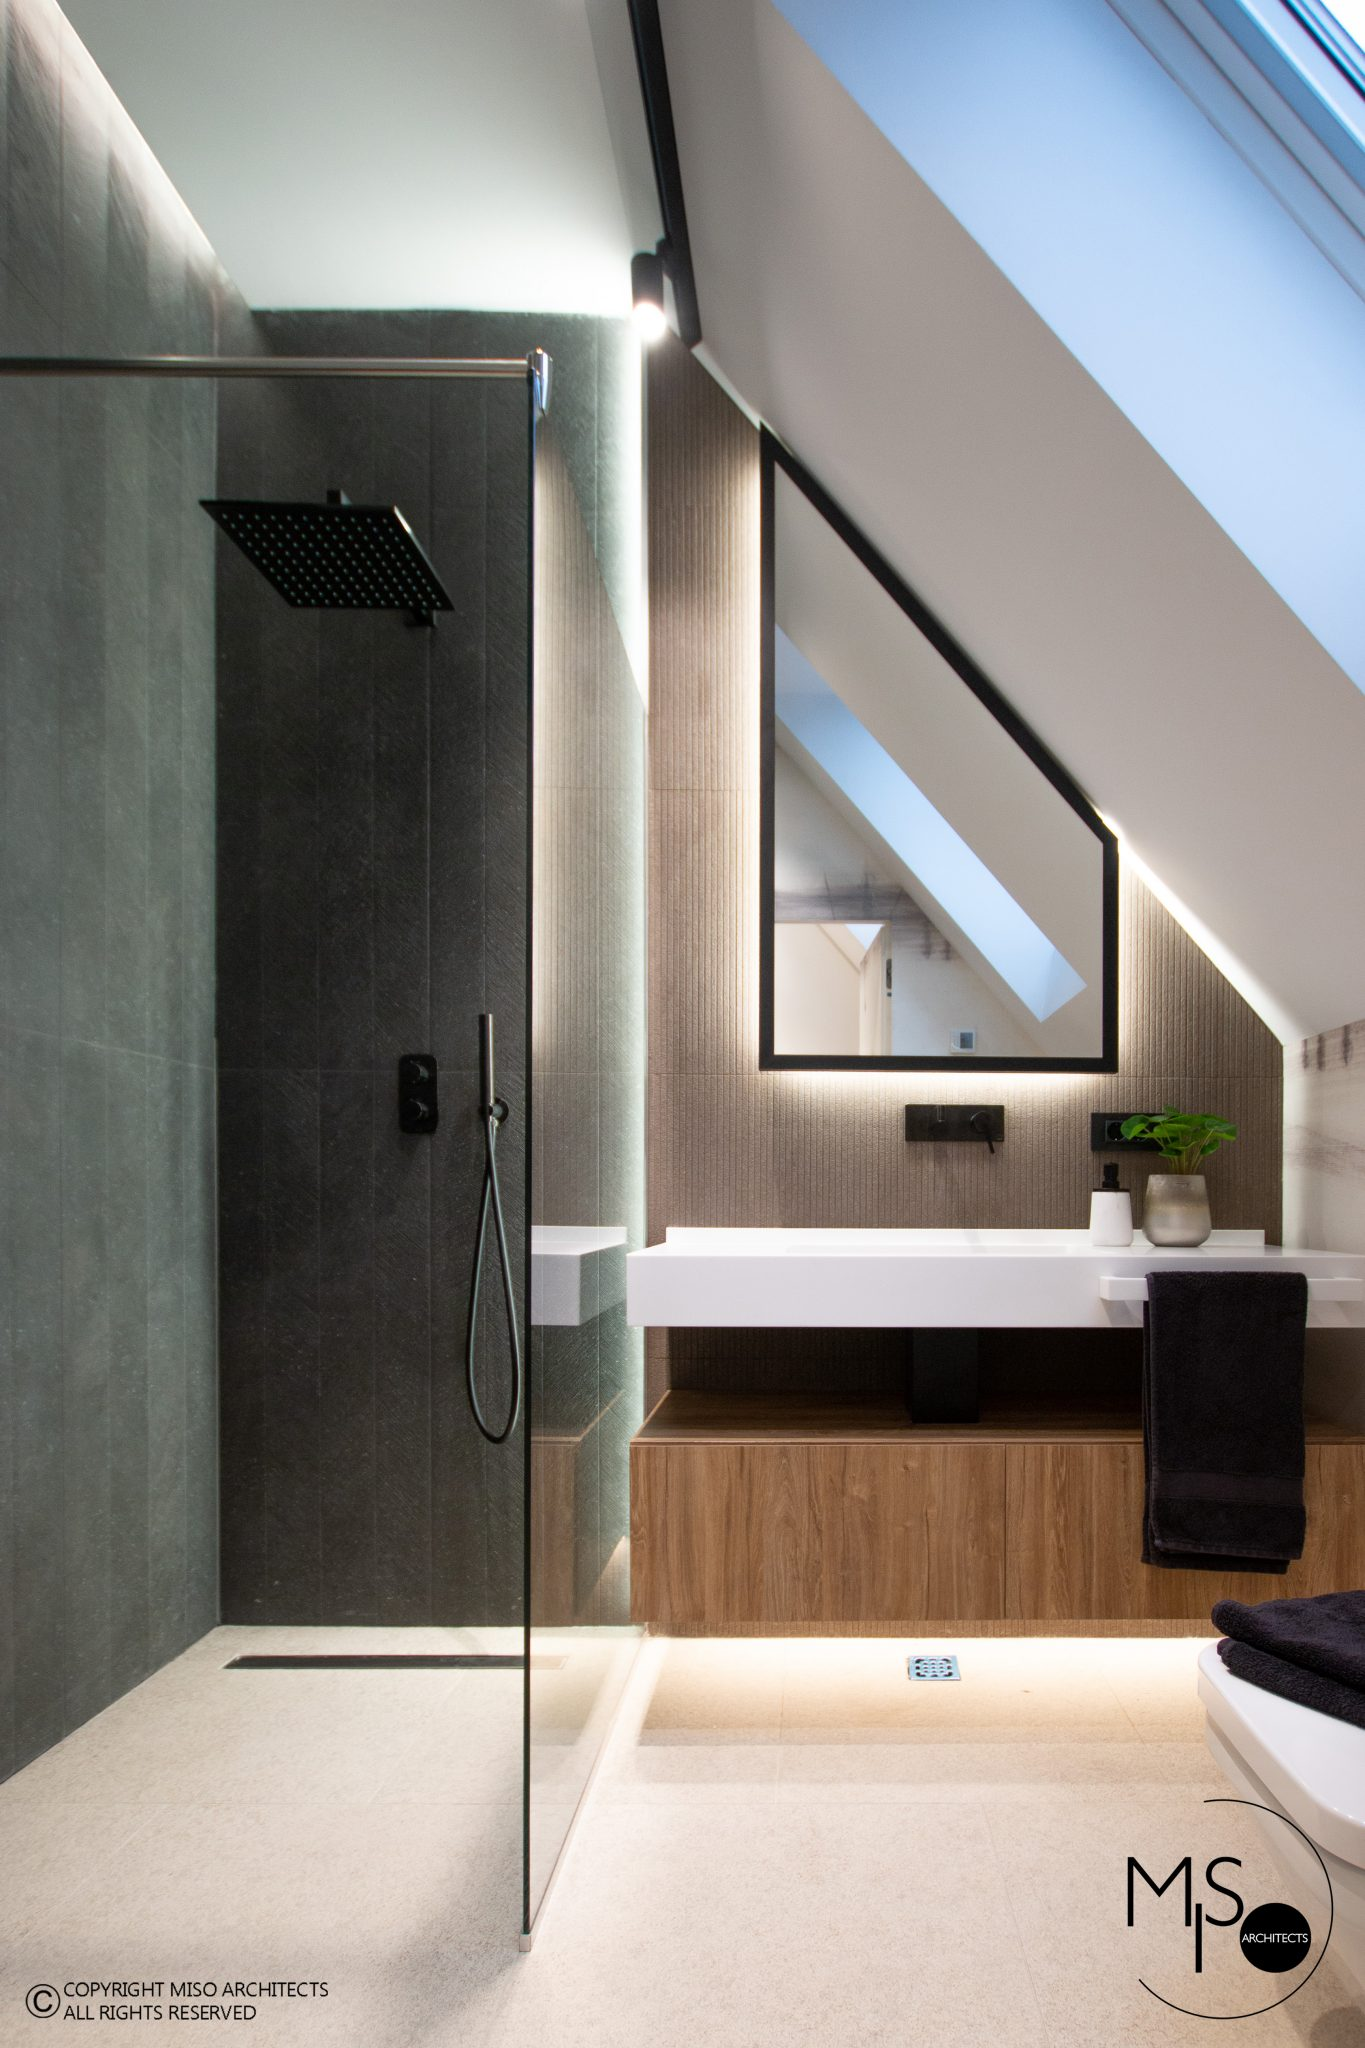 obiecte-sanitare-villeroy-boch-scaled.jpg